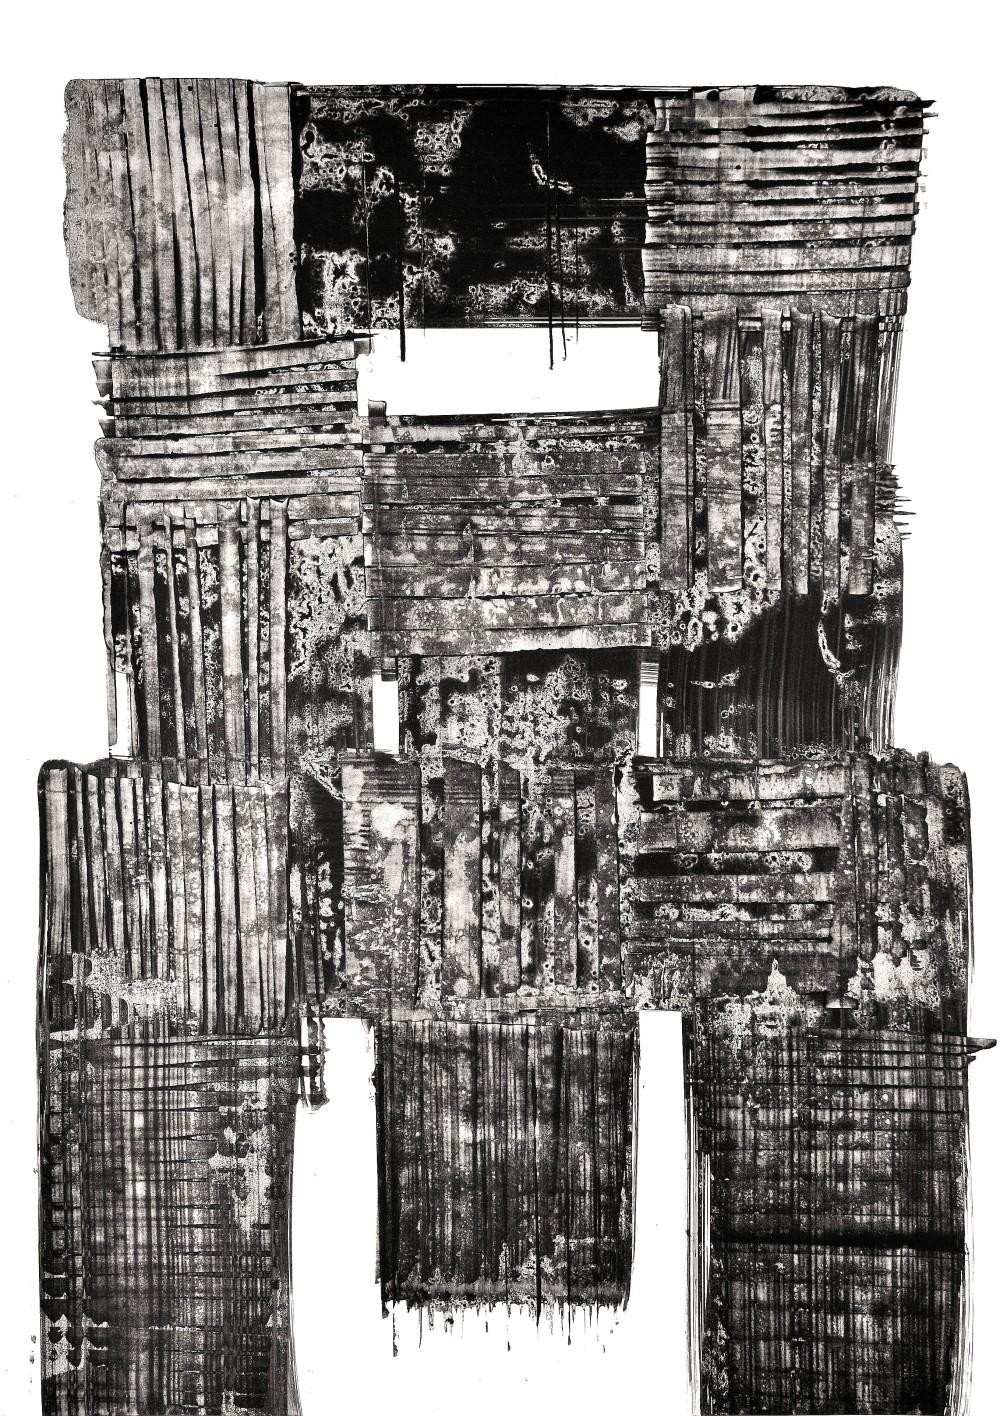 Luigi Pericle, Matri Dei d.d.d., 1964, China su carta, 600 x 420 mm